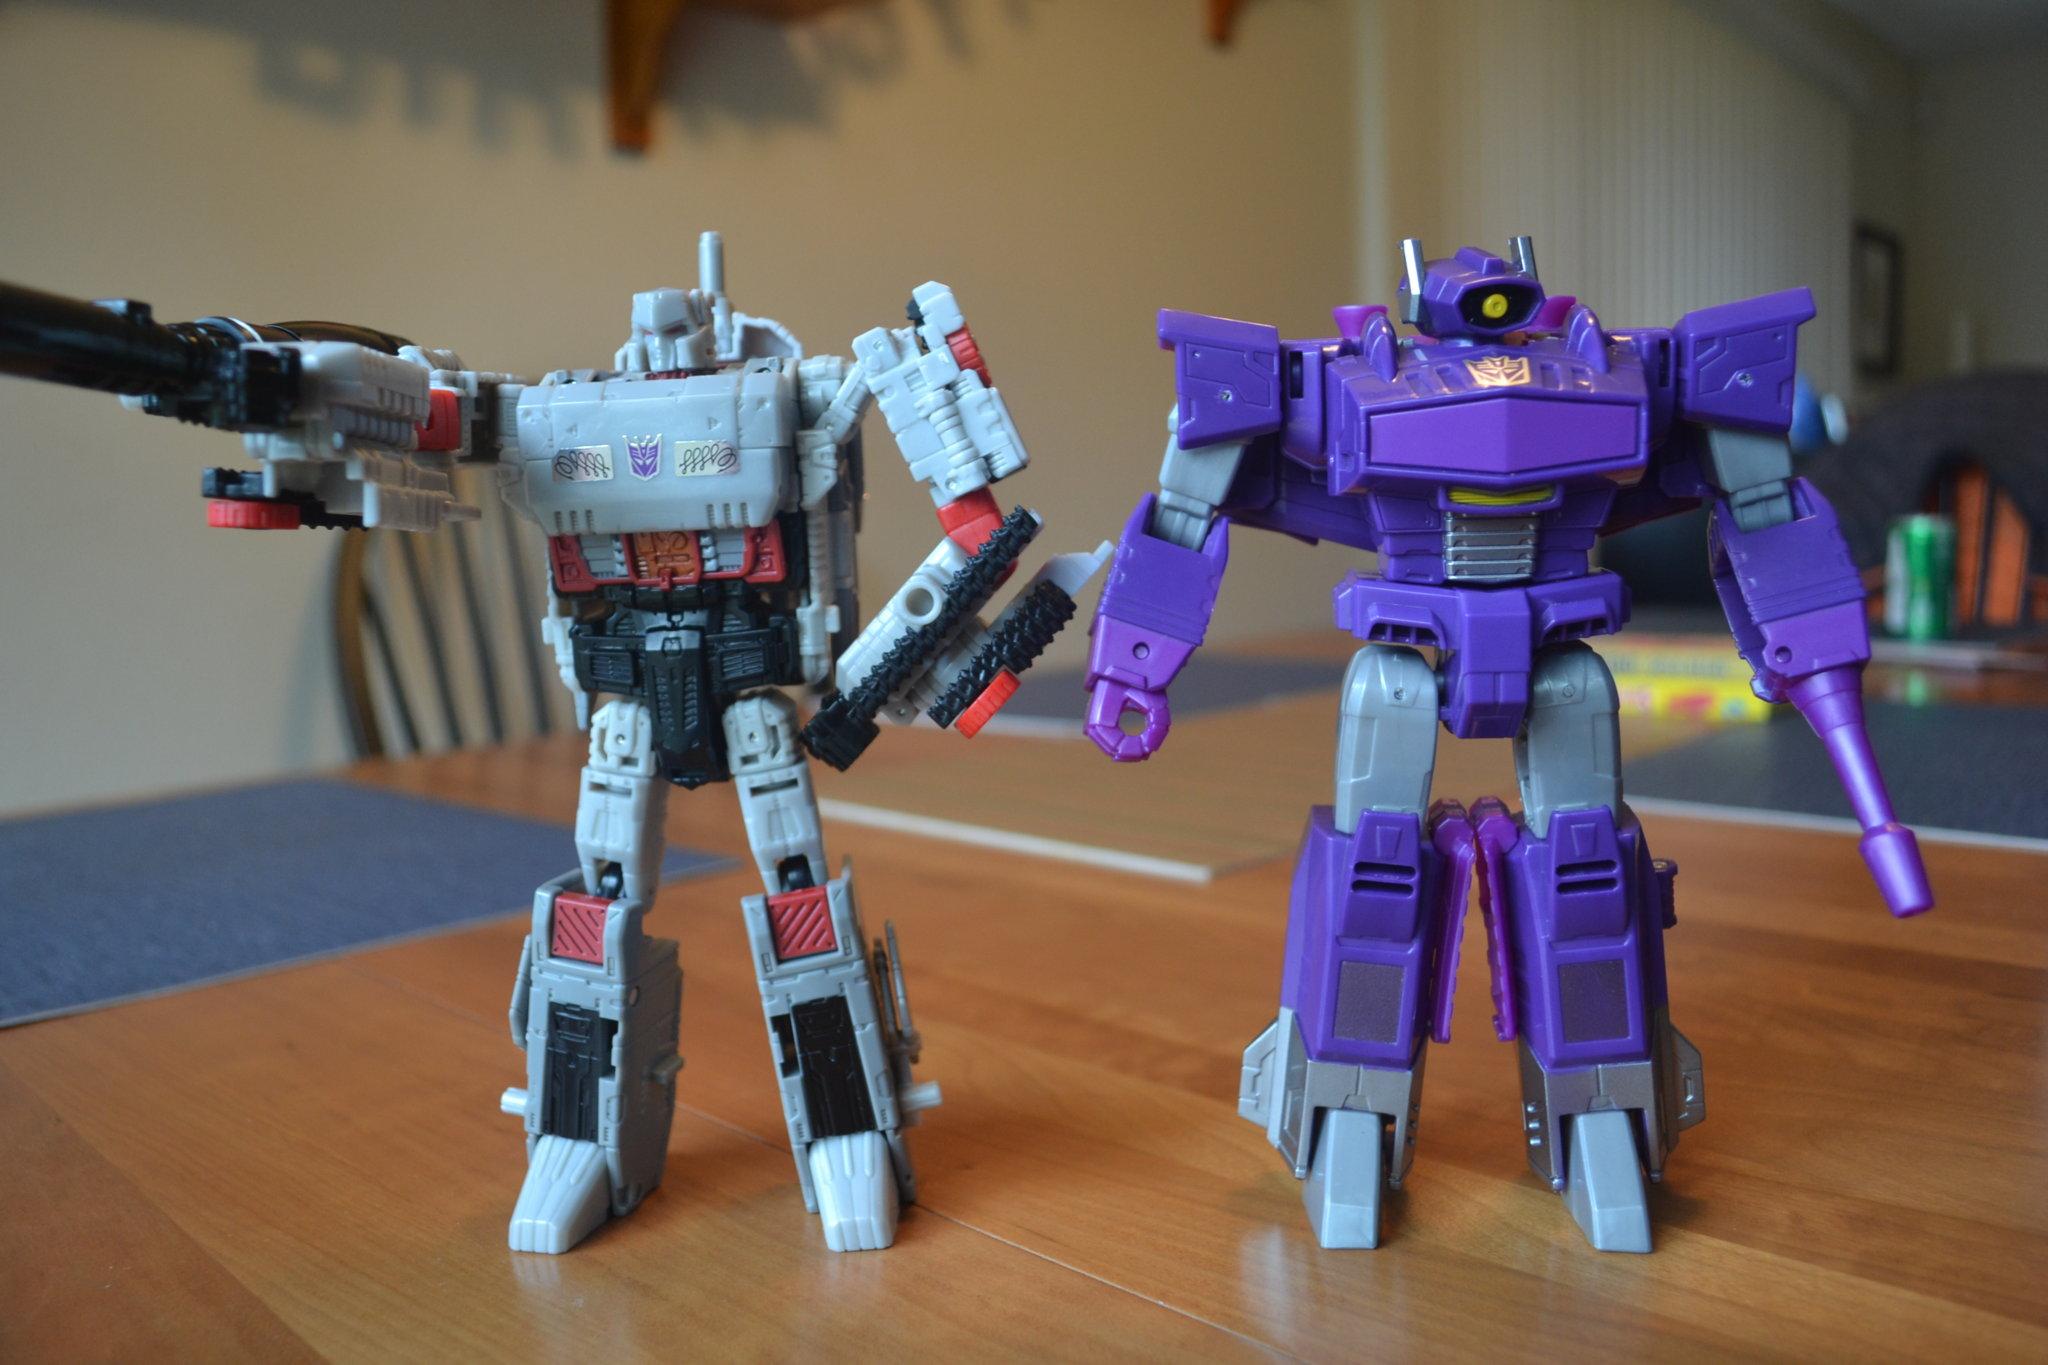 Transformers Cyber Battlion Shockwave Complete Voyager Walgreens Authentics